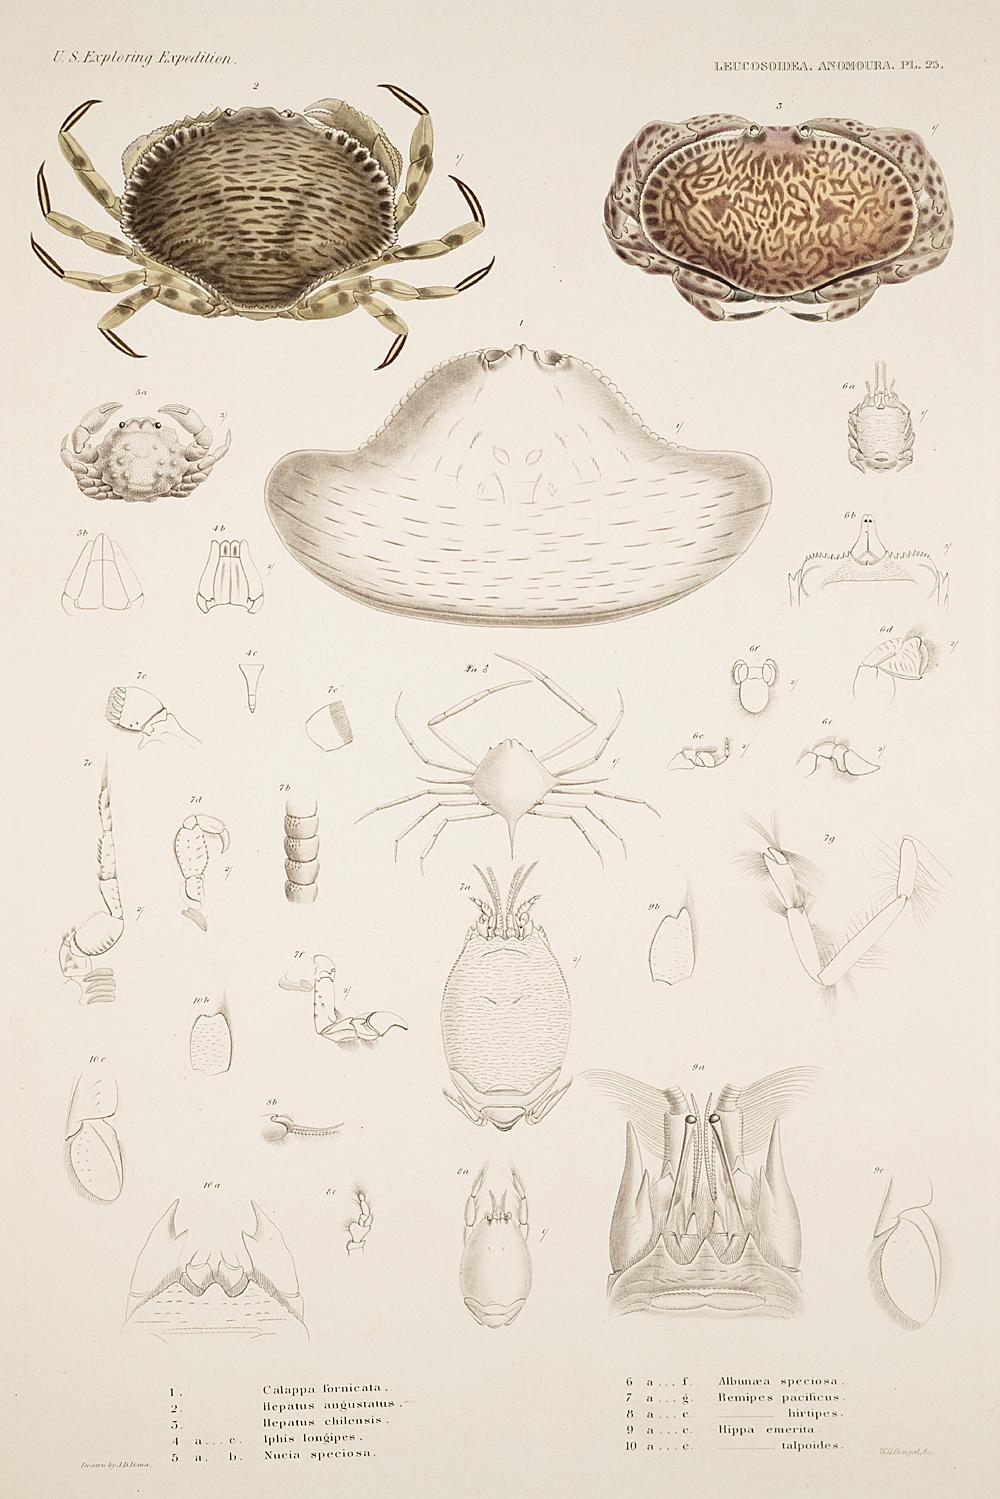 Leucosoidea. Anomoura. Pl. 25,  Image number:SIL19-21-083b